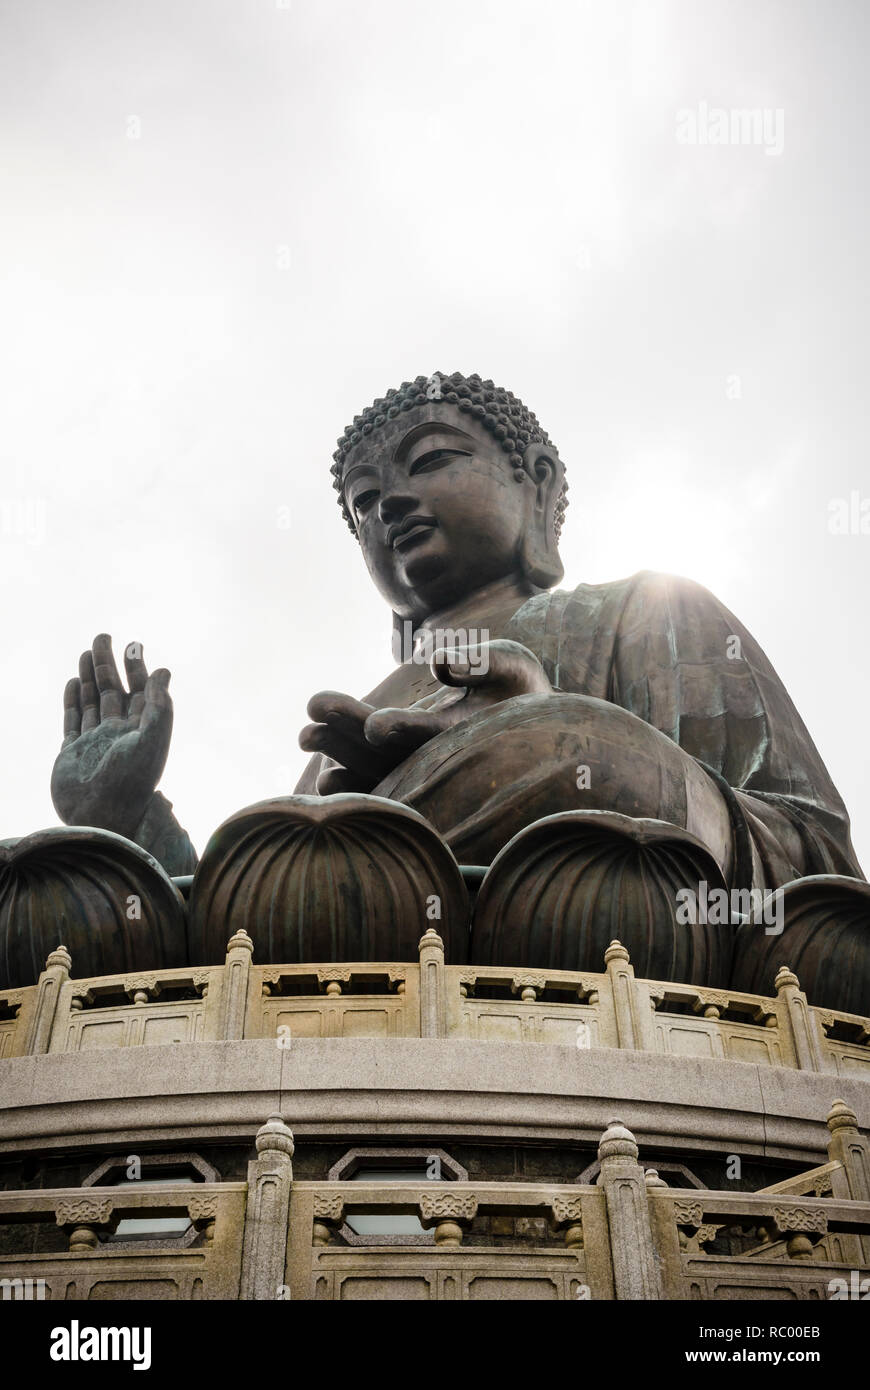 Sun rays break through the cloud to reflect off the shoulder of the bronze Tian Tan Buddha, Lantau Island, Hong Kong - Stock Image